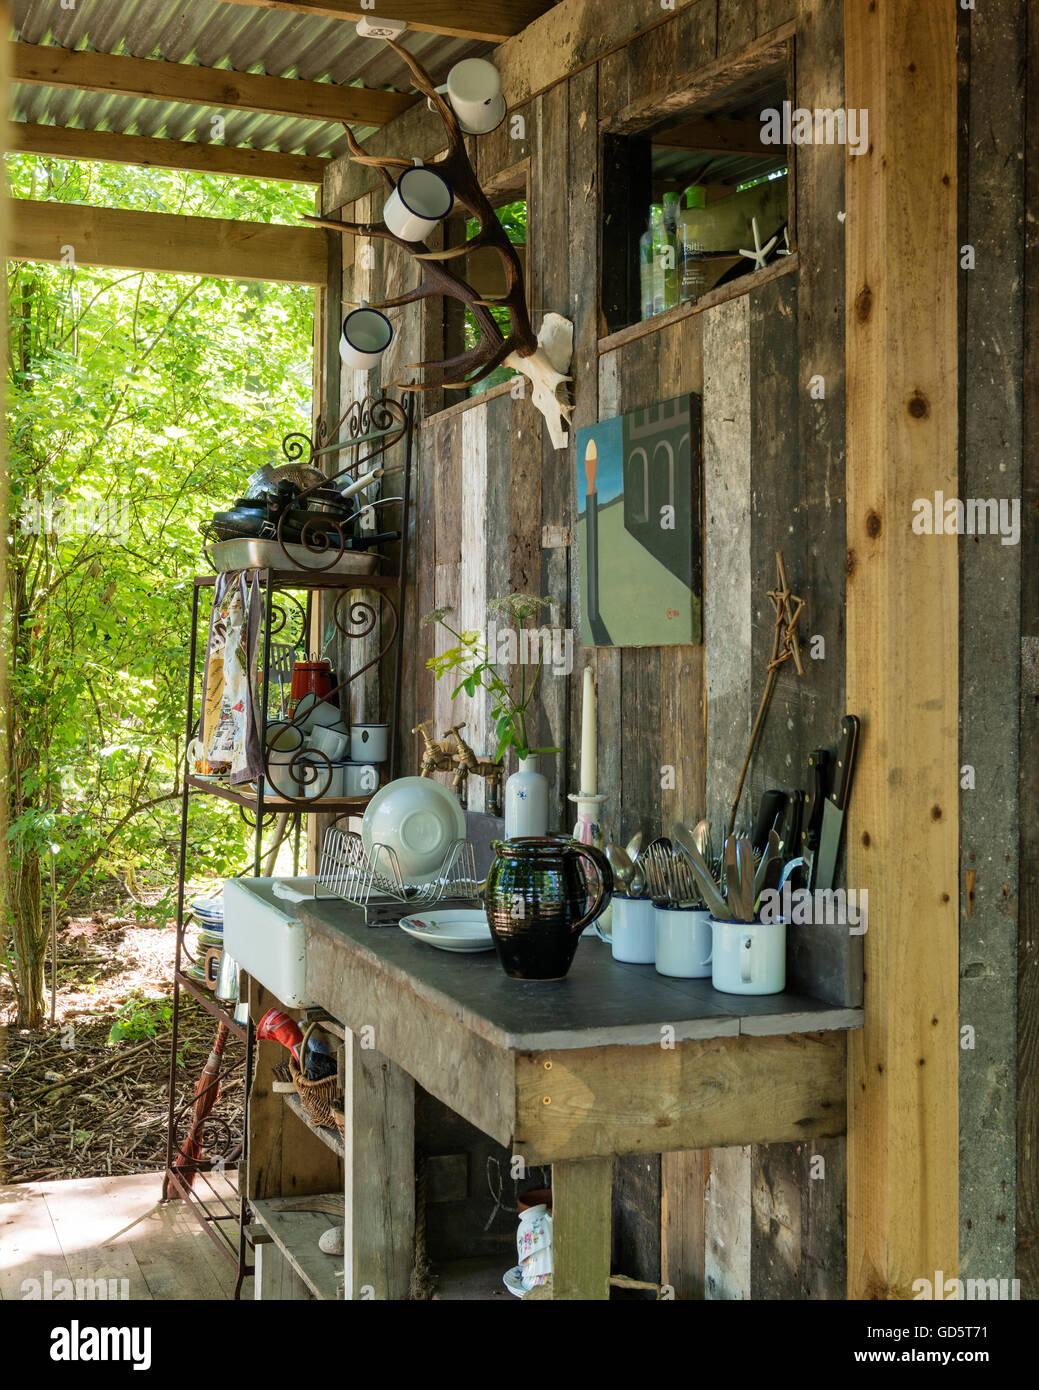 Outdoor Shower Cabin Stockfotos & Outdoor Shower Cabin Bilder - Alamy